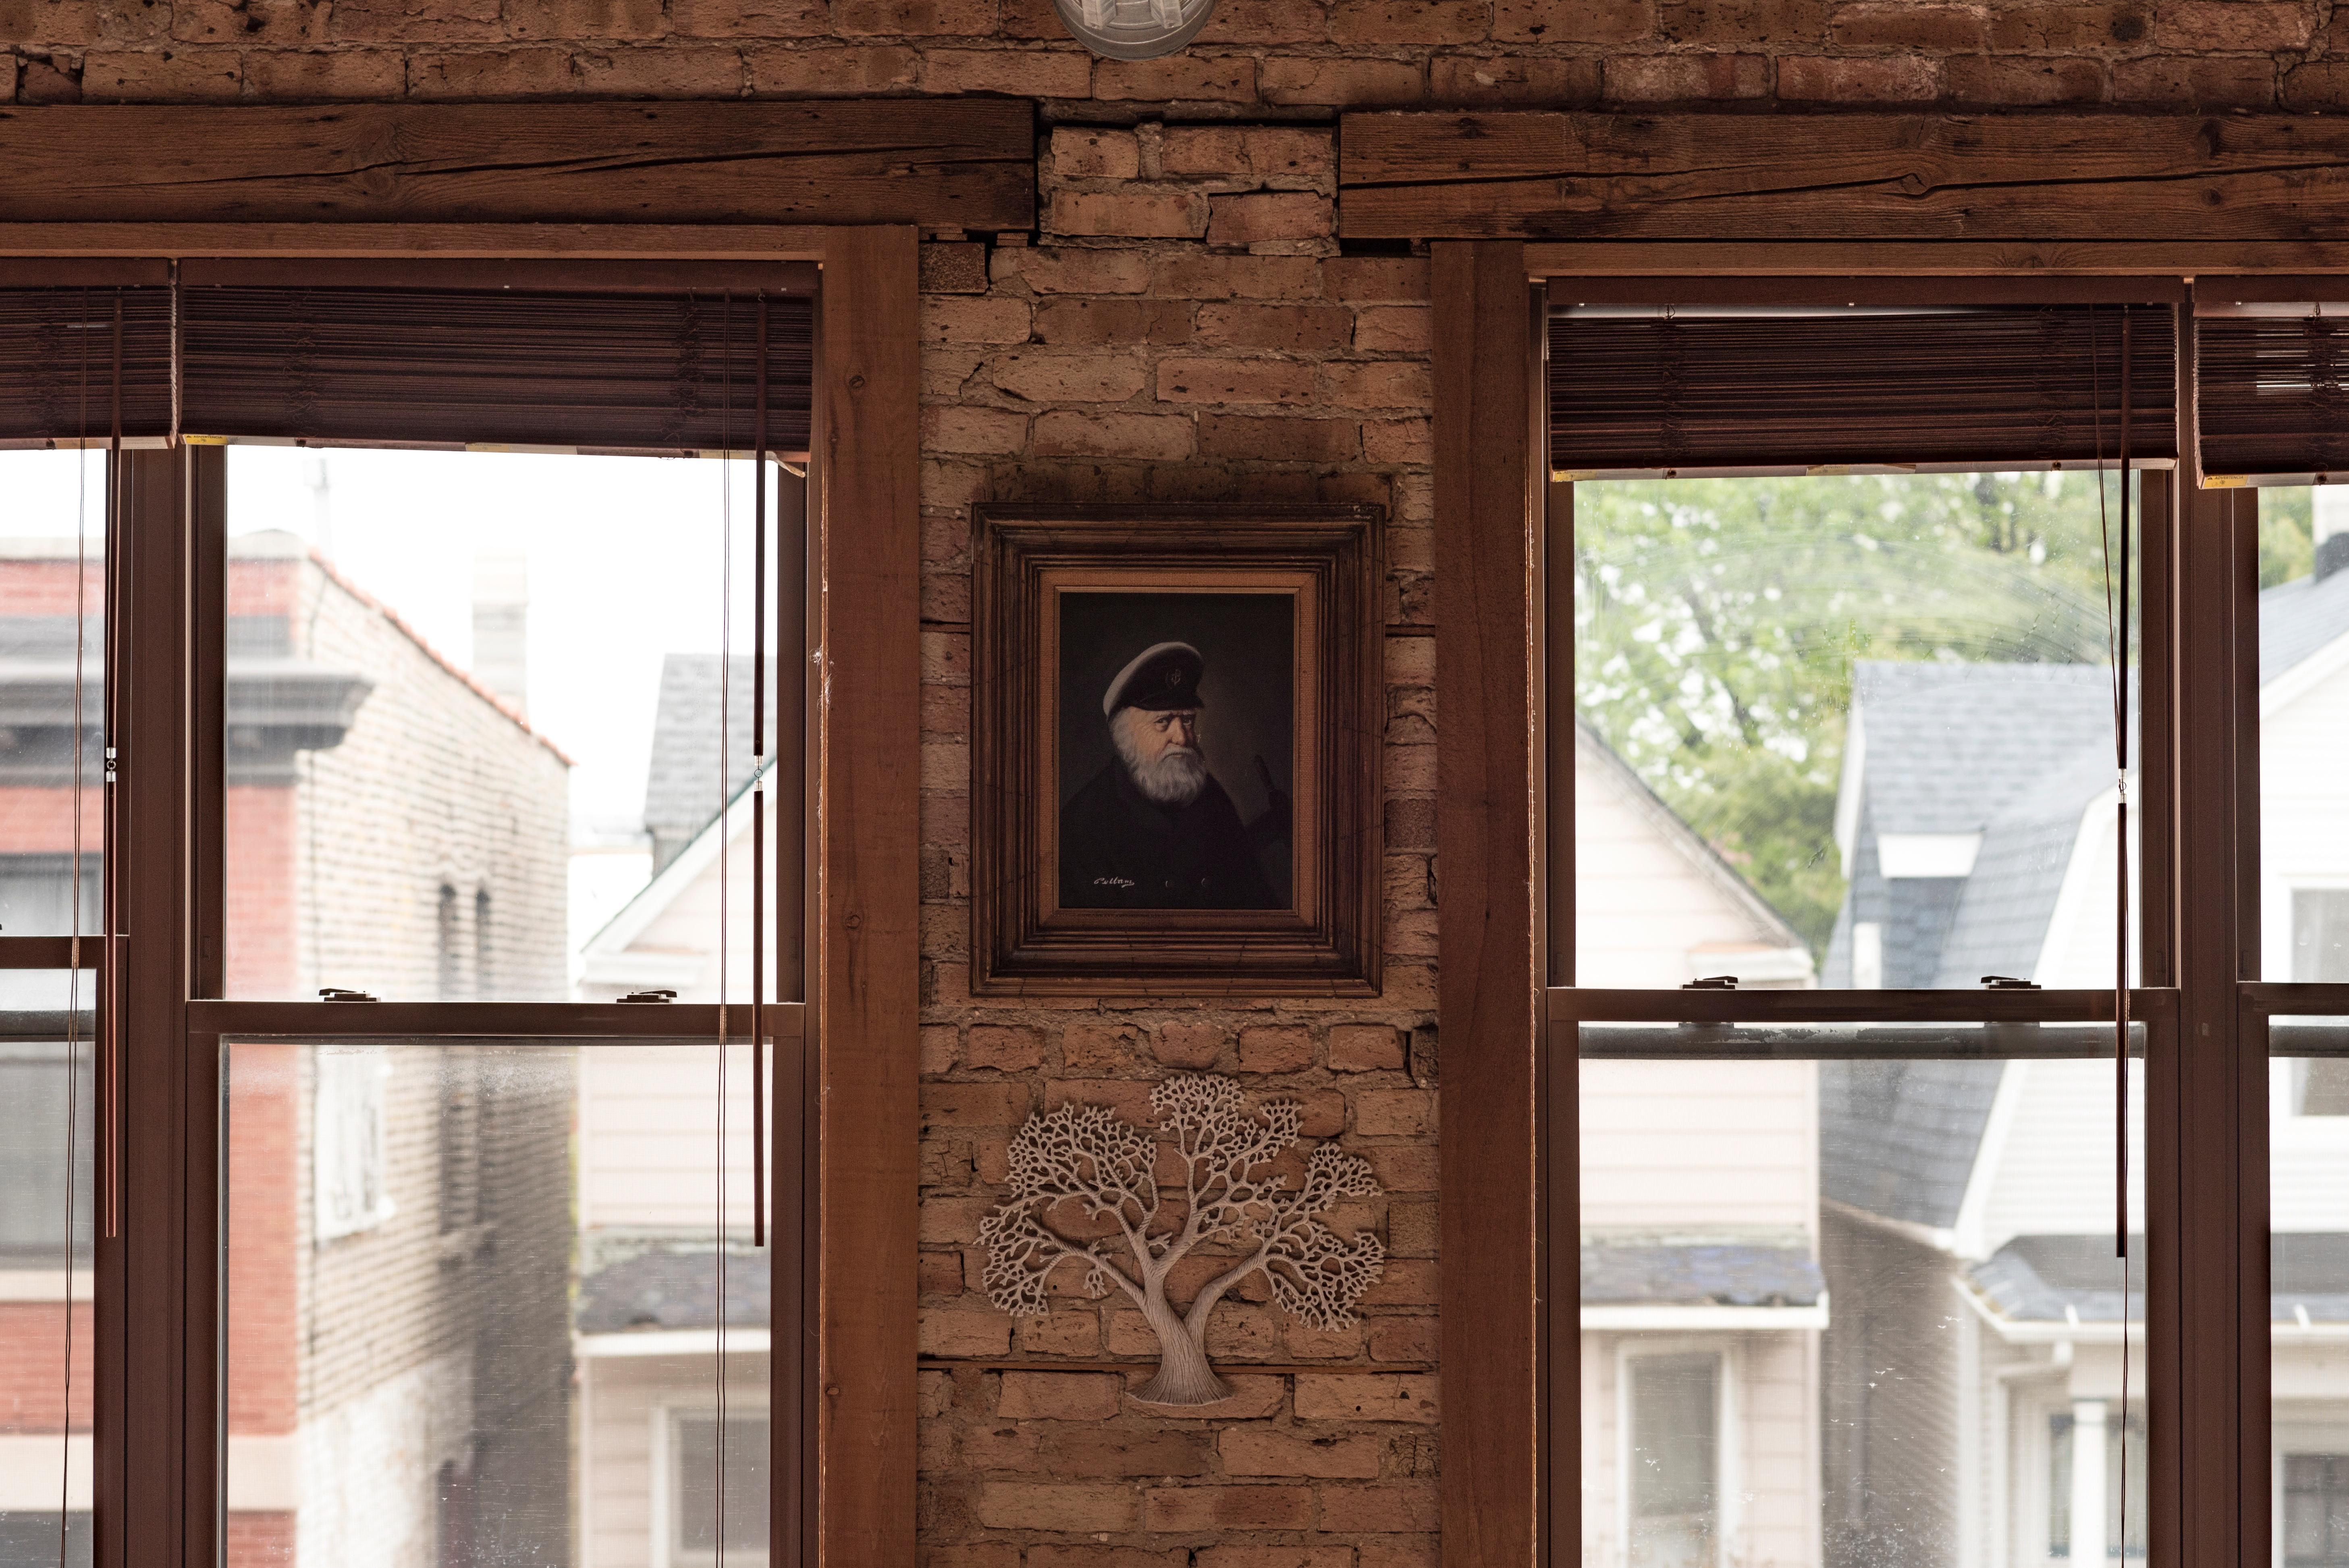 Fotos gratis arquitectura madera casa pared porche for Porche diseno